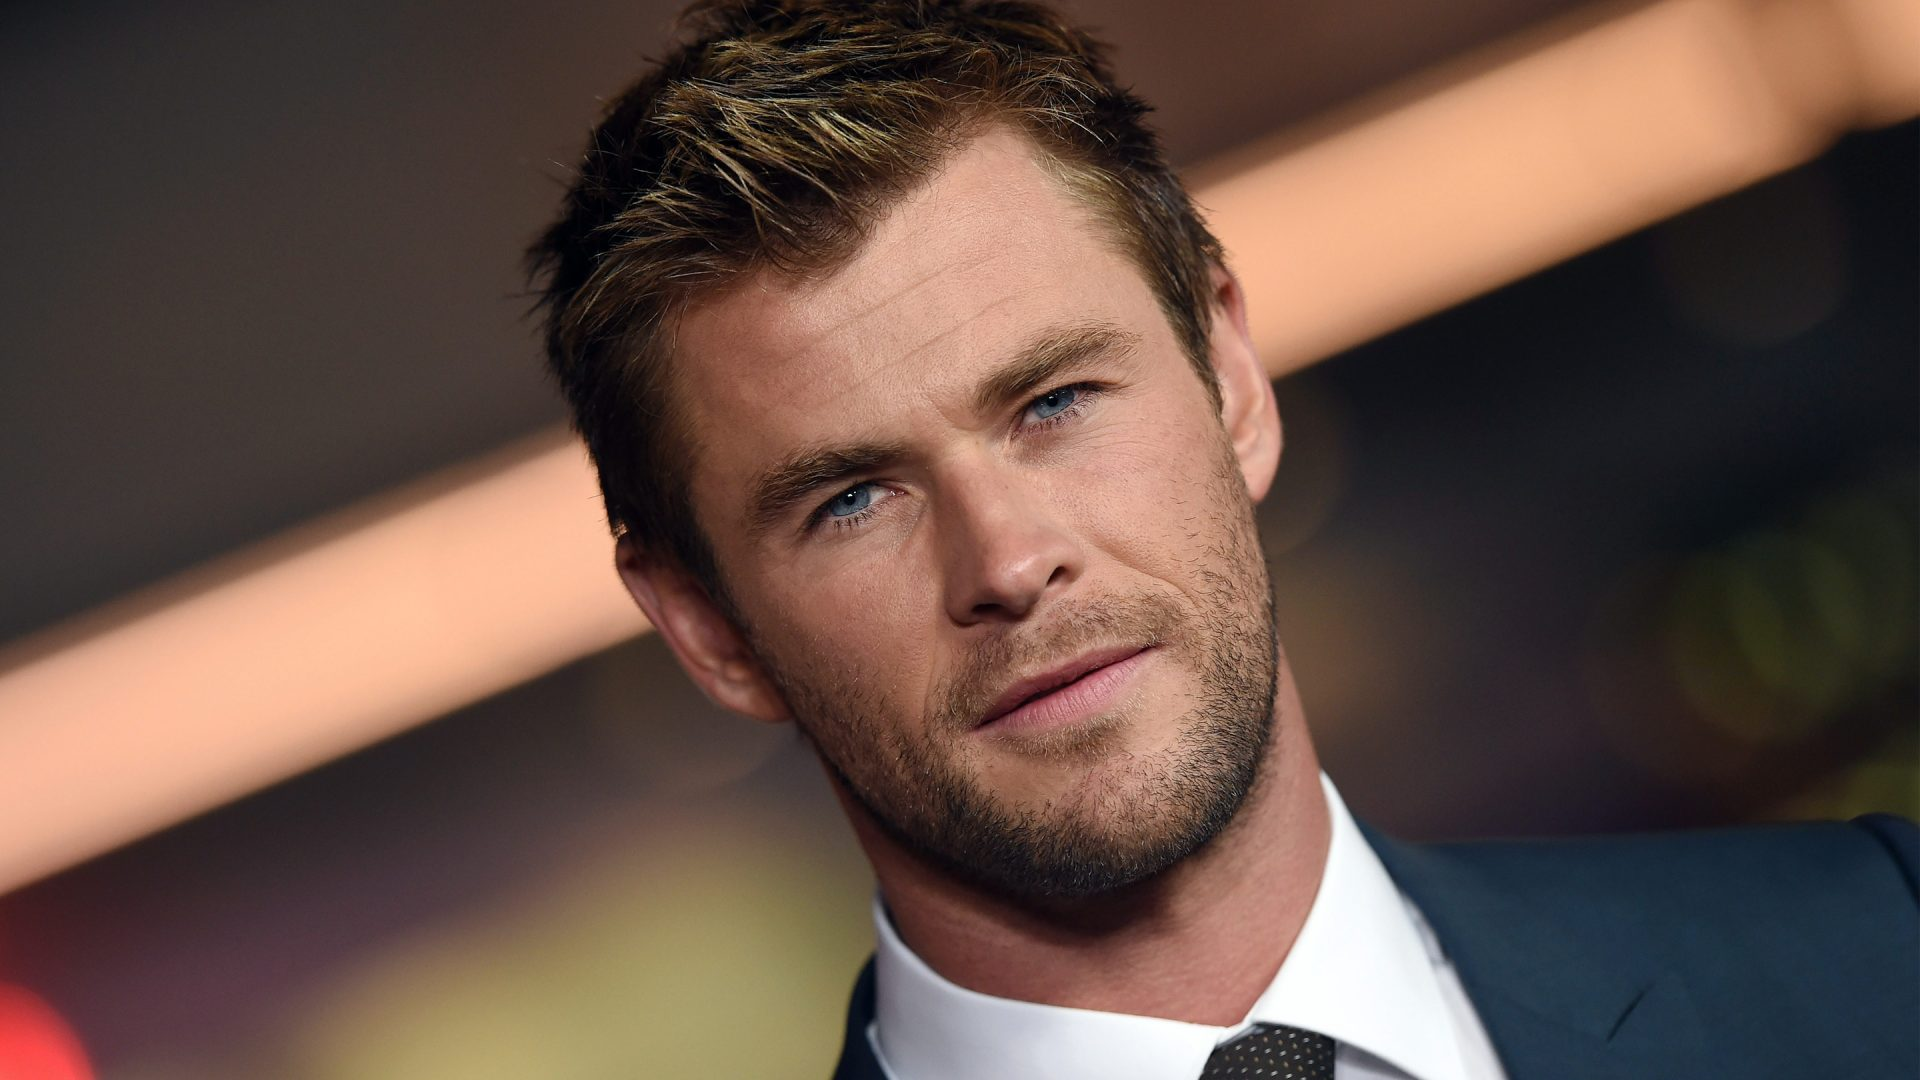 Chris Hemsworth Photos